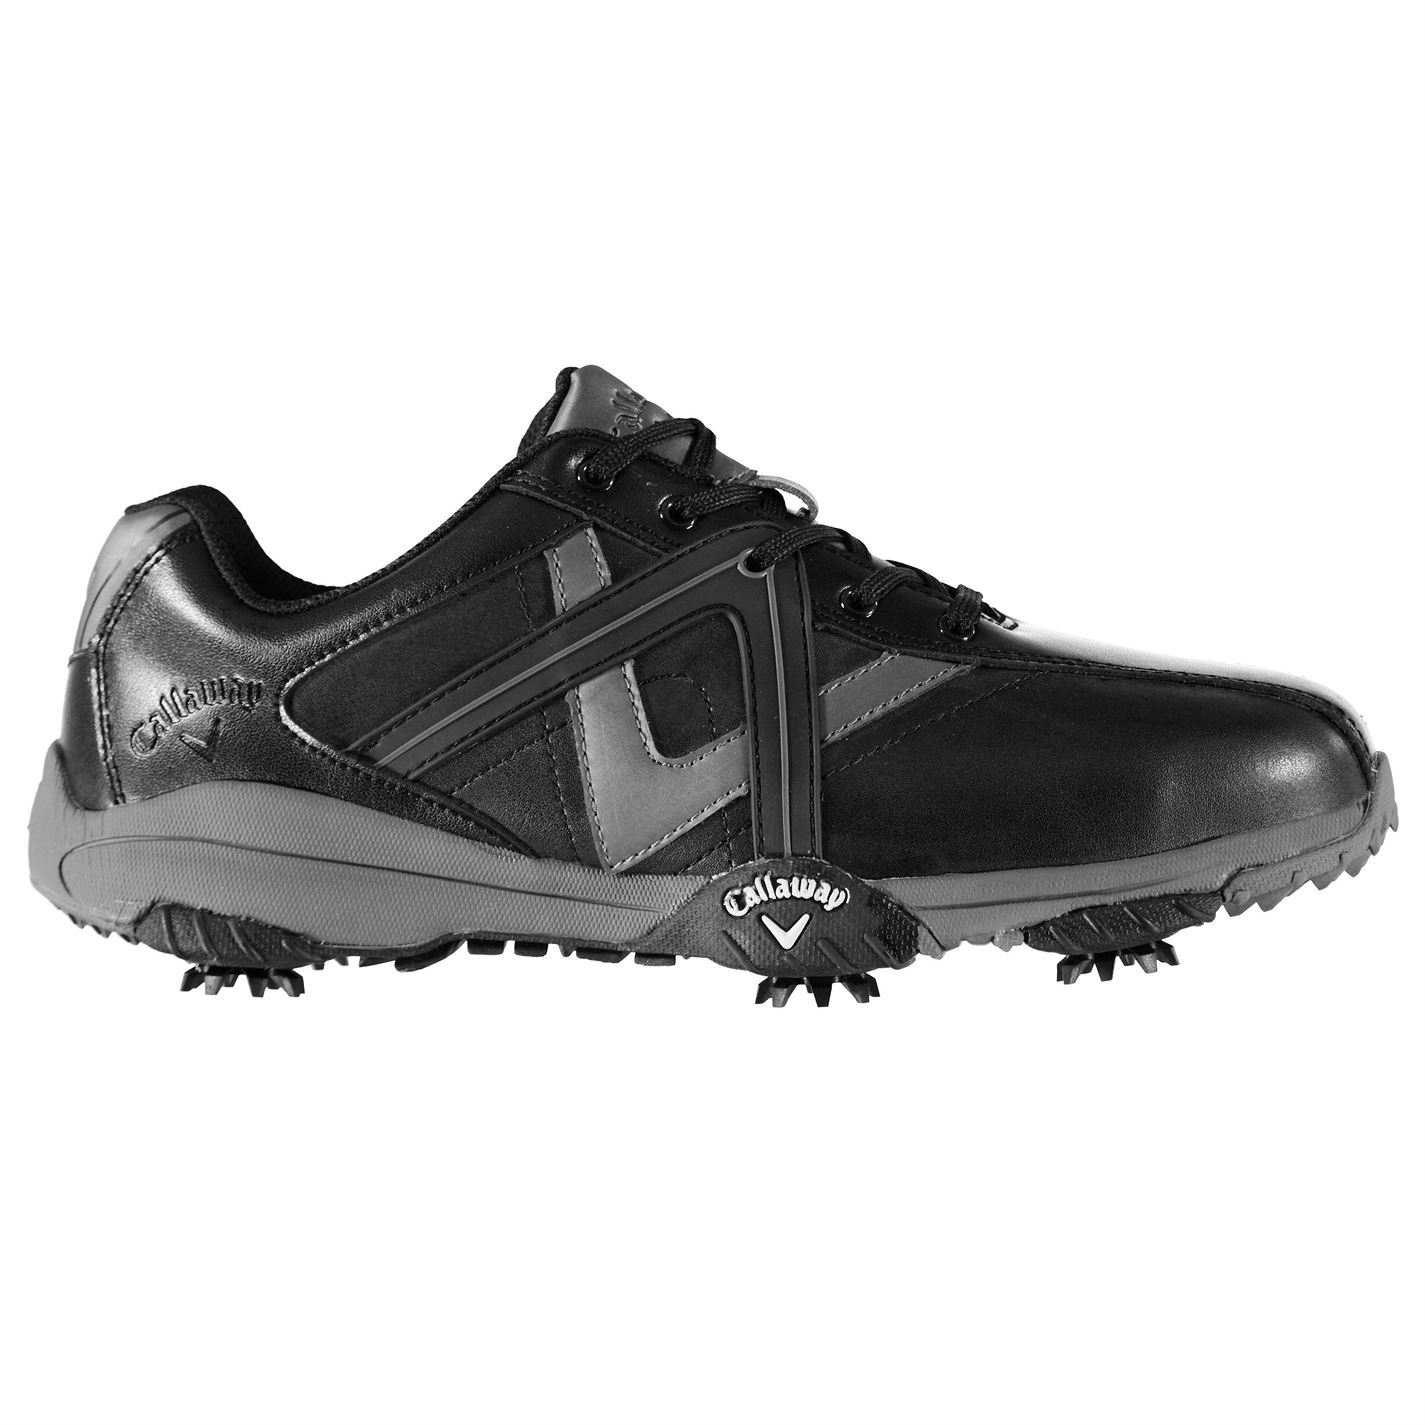 Callaway-Cheviot-ll-Golf-Shoes-Mens-Spikes-Footwear thumbnail 7